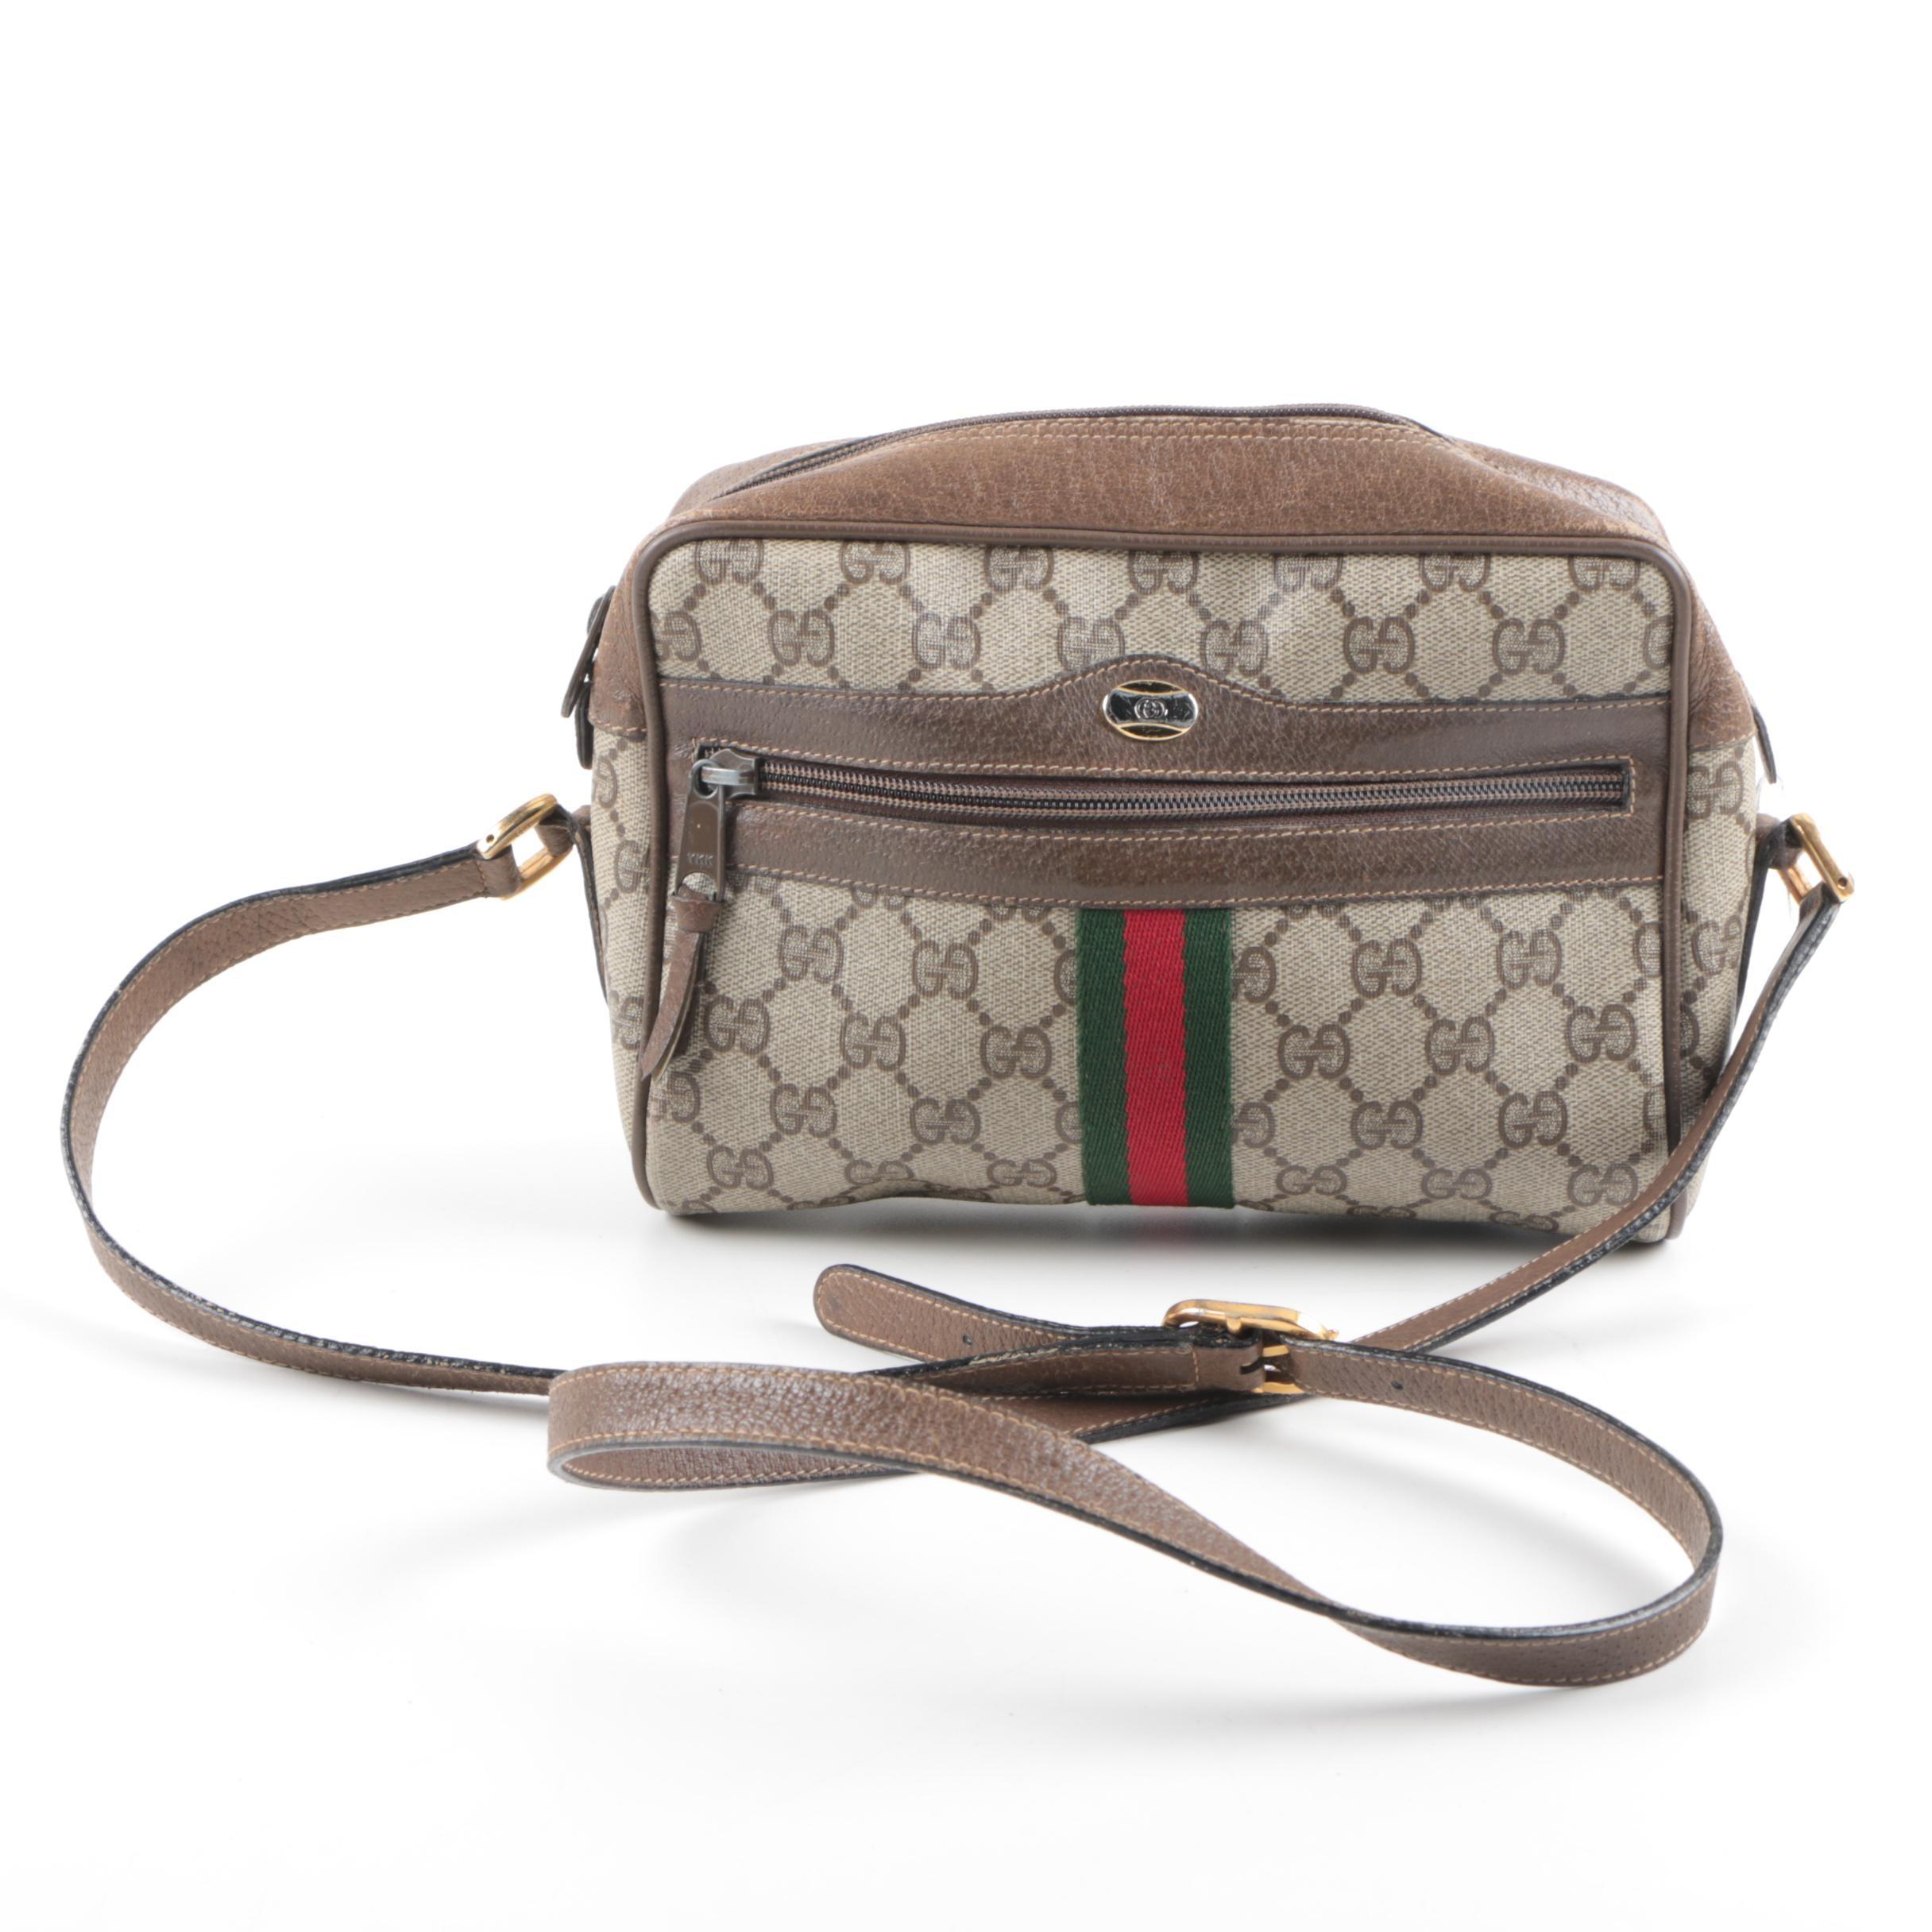 Gucci Monogram Coated Canvas Handbag